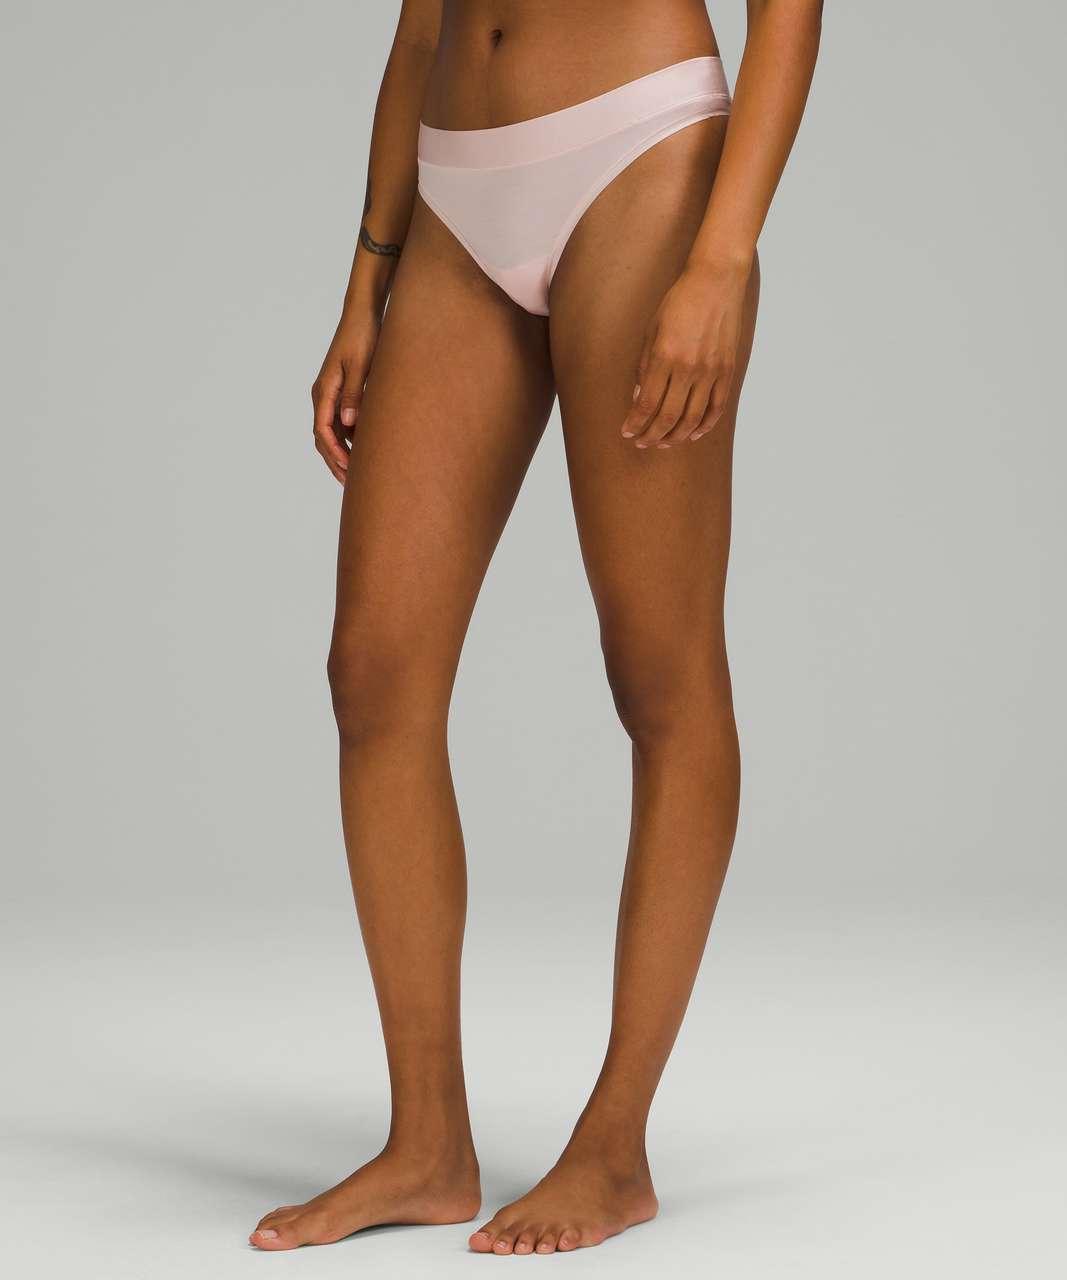 Lululemon UnderEase Mid Rise Thong Underwear 3 Pack - Black / Pink Mist / Double Dimension Starlight Black